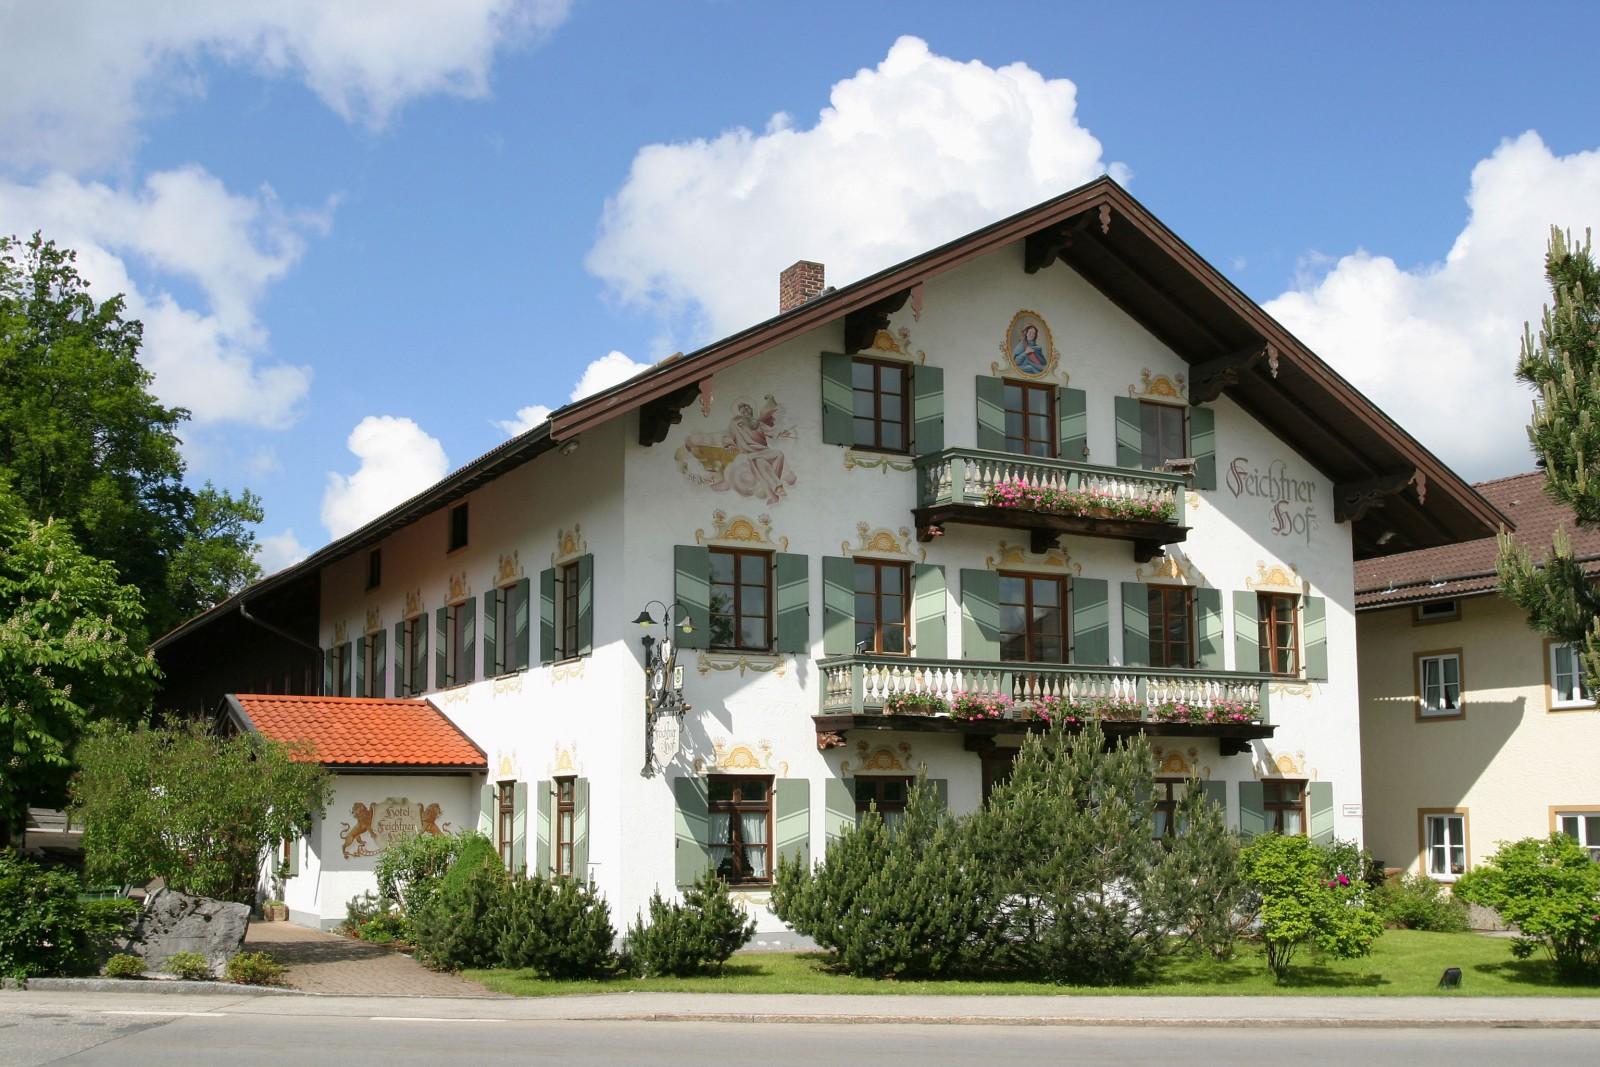 Hotel Tegernsee Restaurant